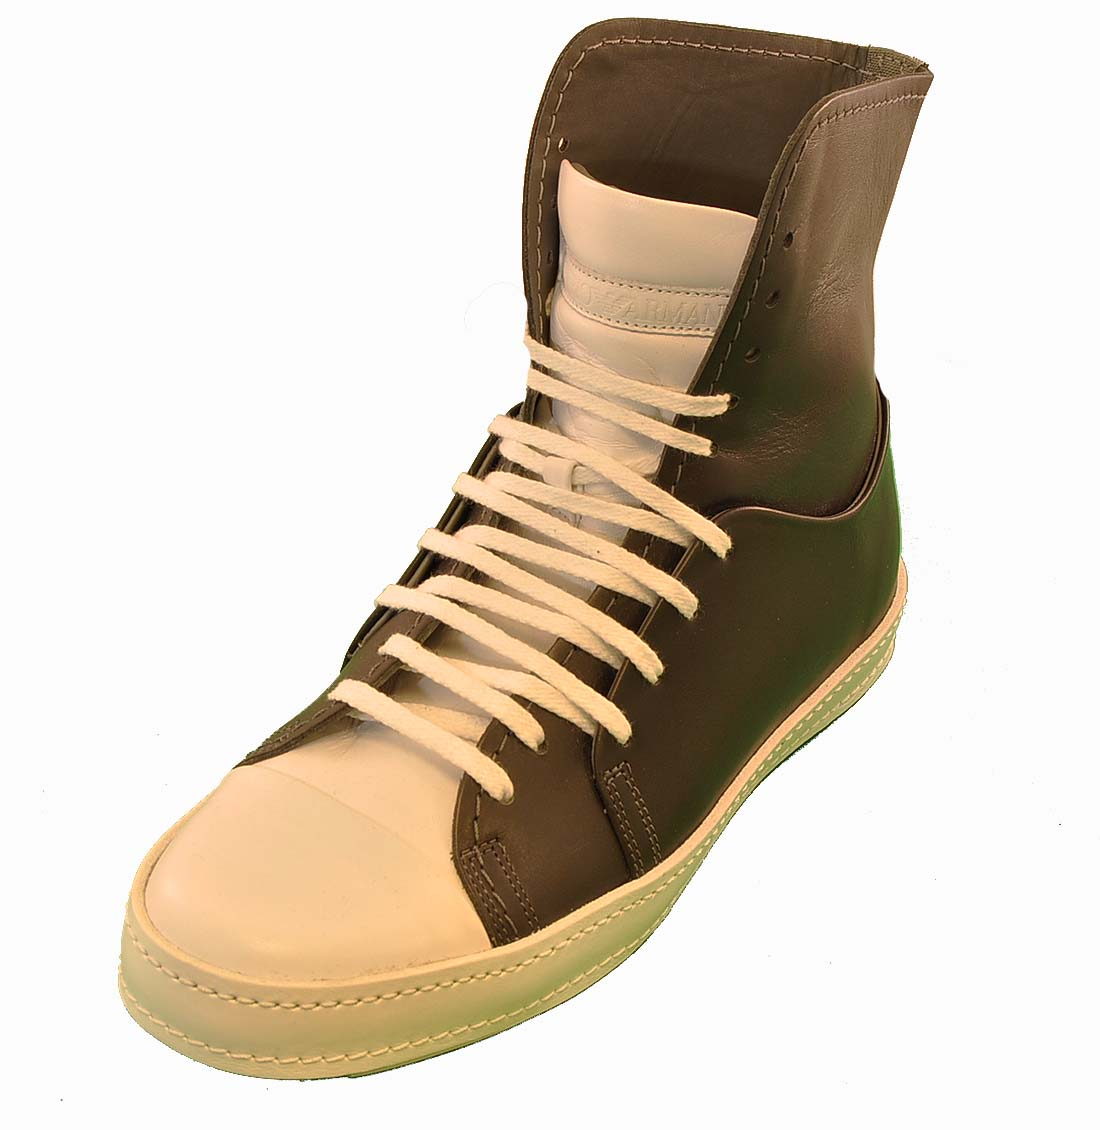 Emporio Armani BLACK Leather Shoe